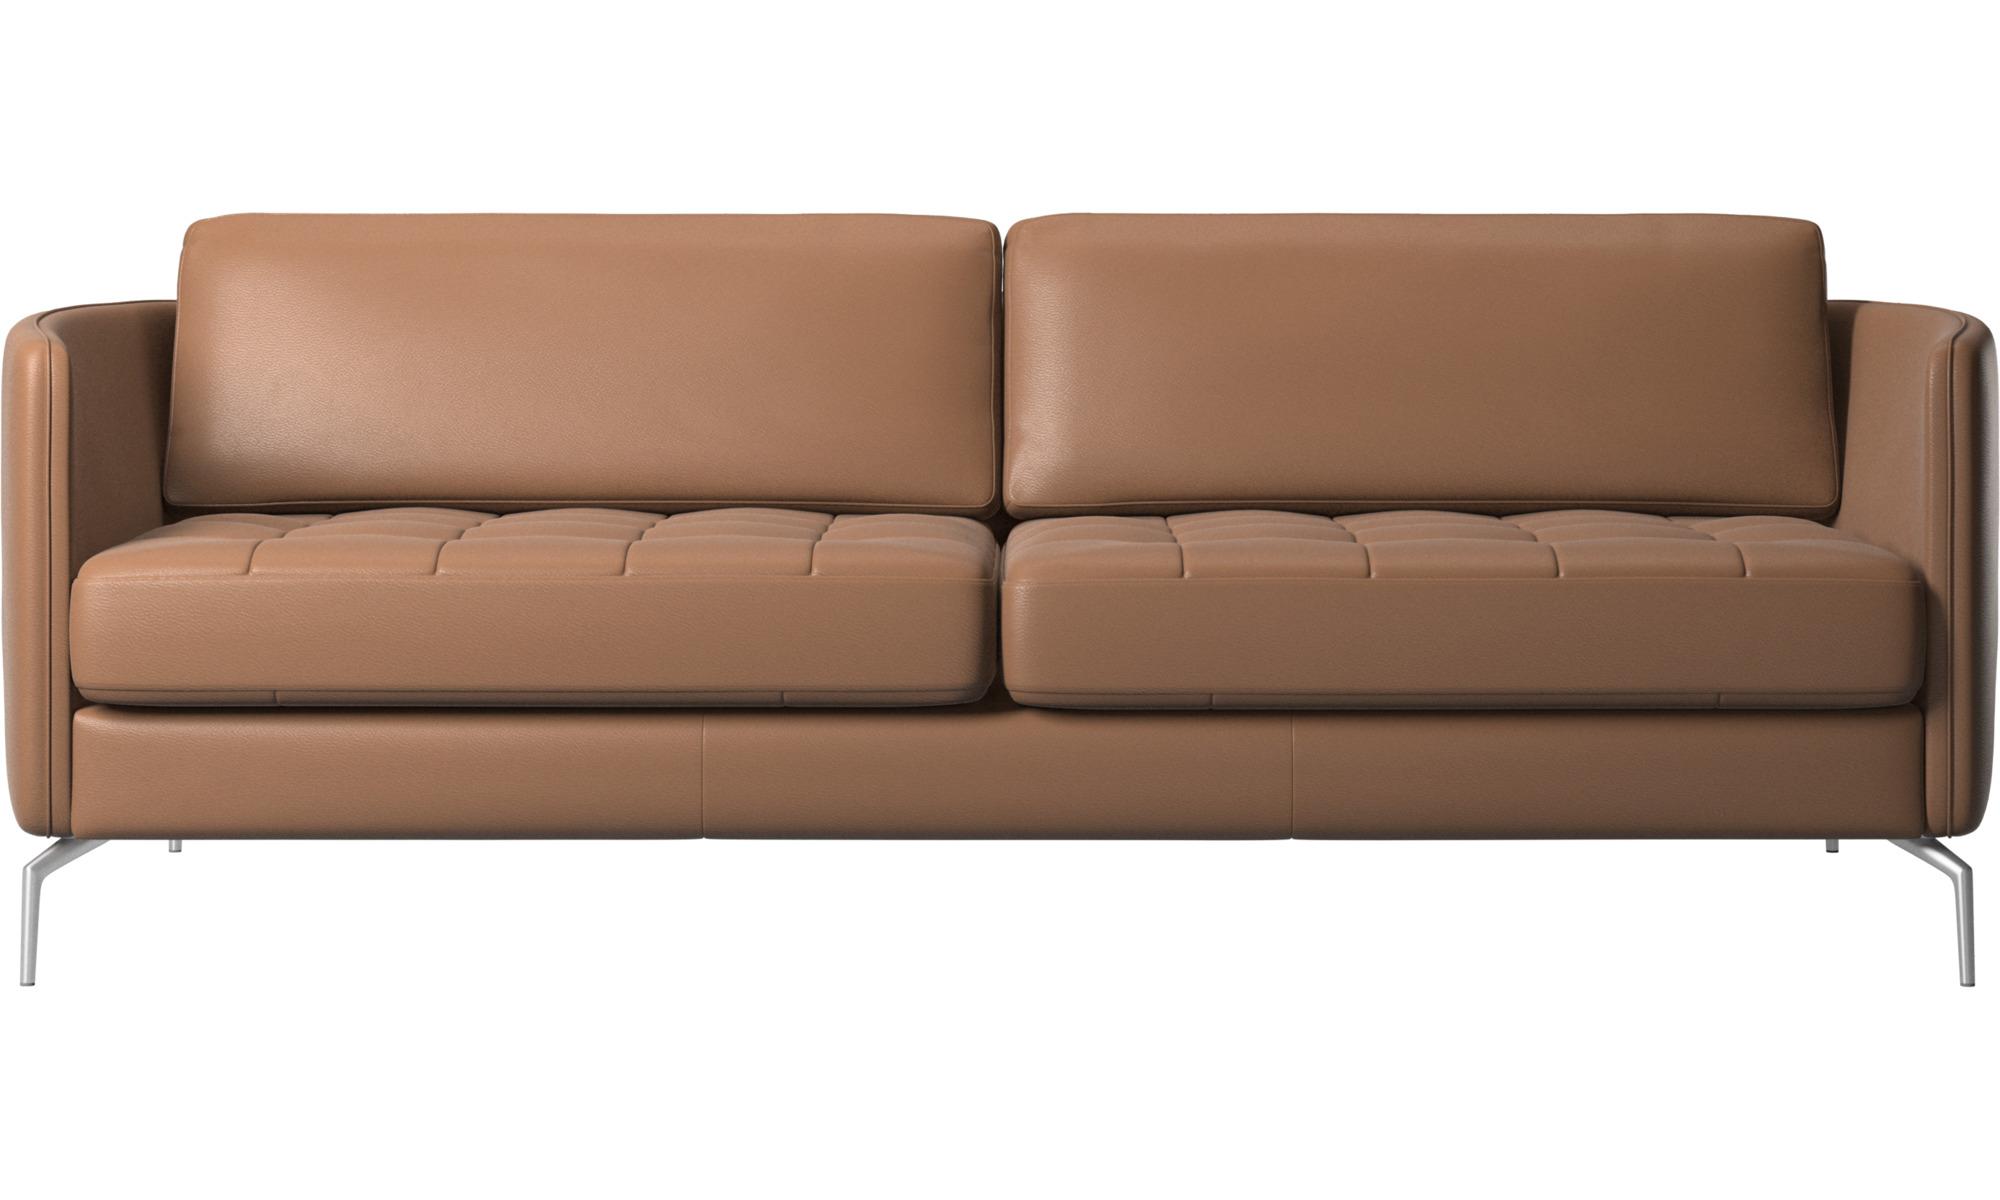 2 5 Seater Sofas Osaka Sofa Tufted